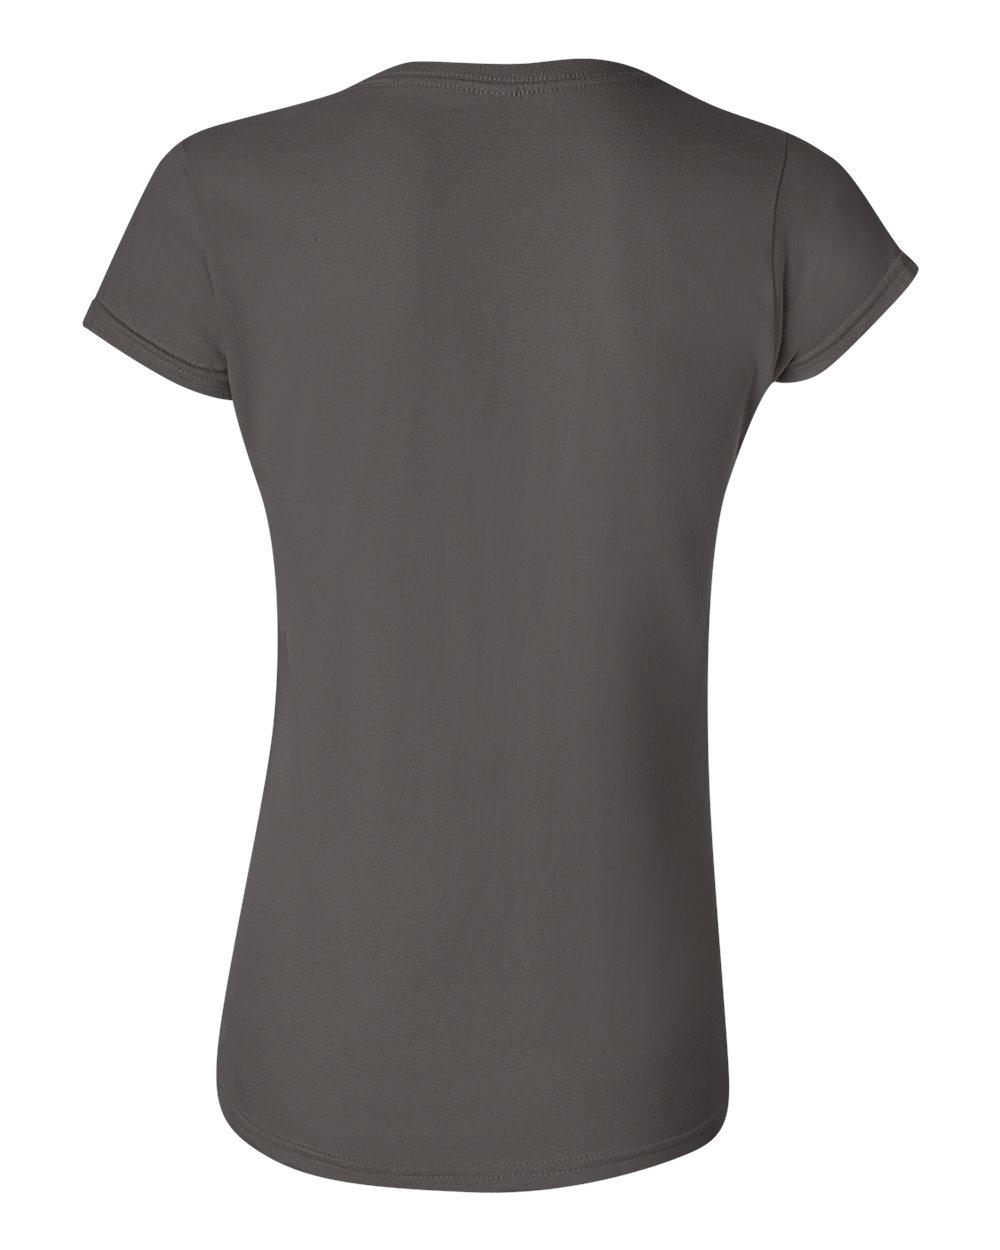 0e1896ef Gildan Womens Softstyle 4.5 oz. Junior Fit T-Shirt G640L Size S-2XL ...